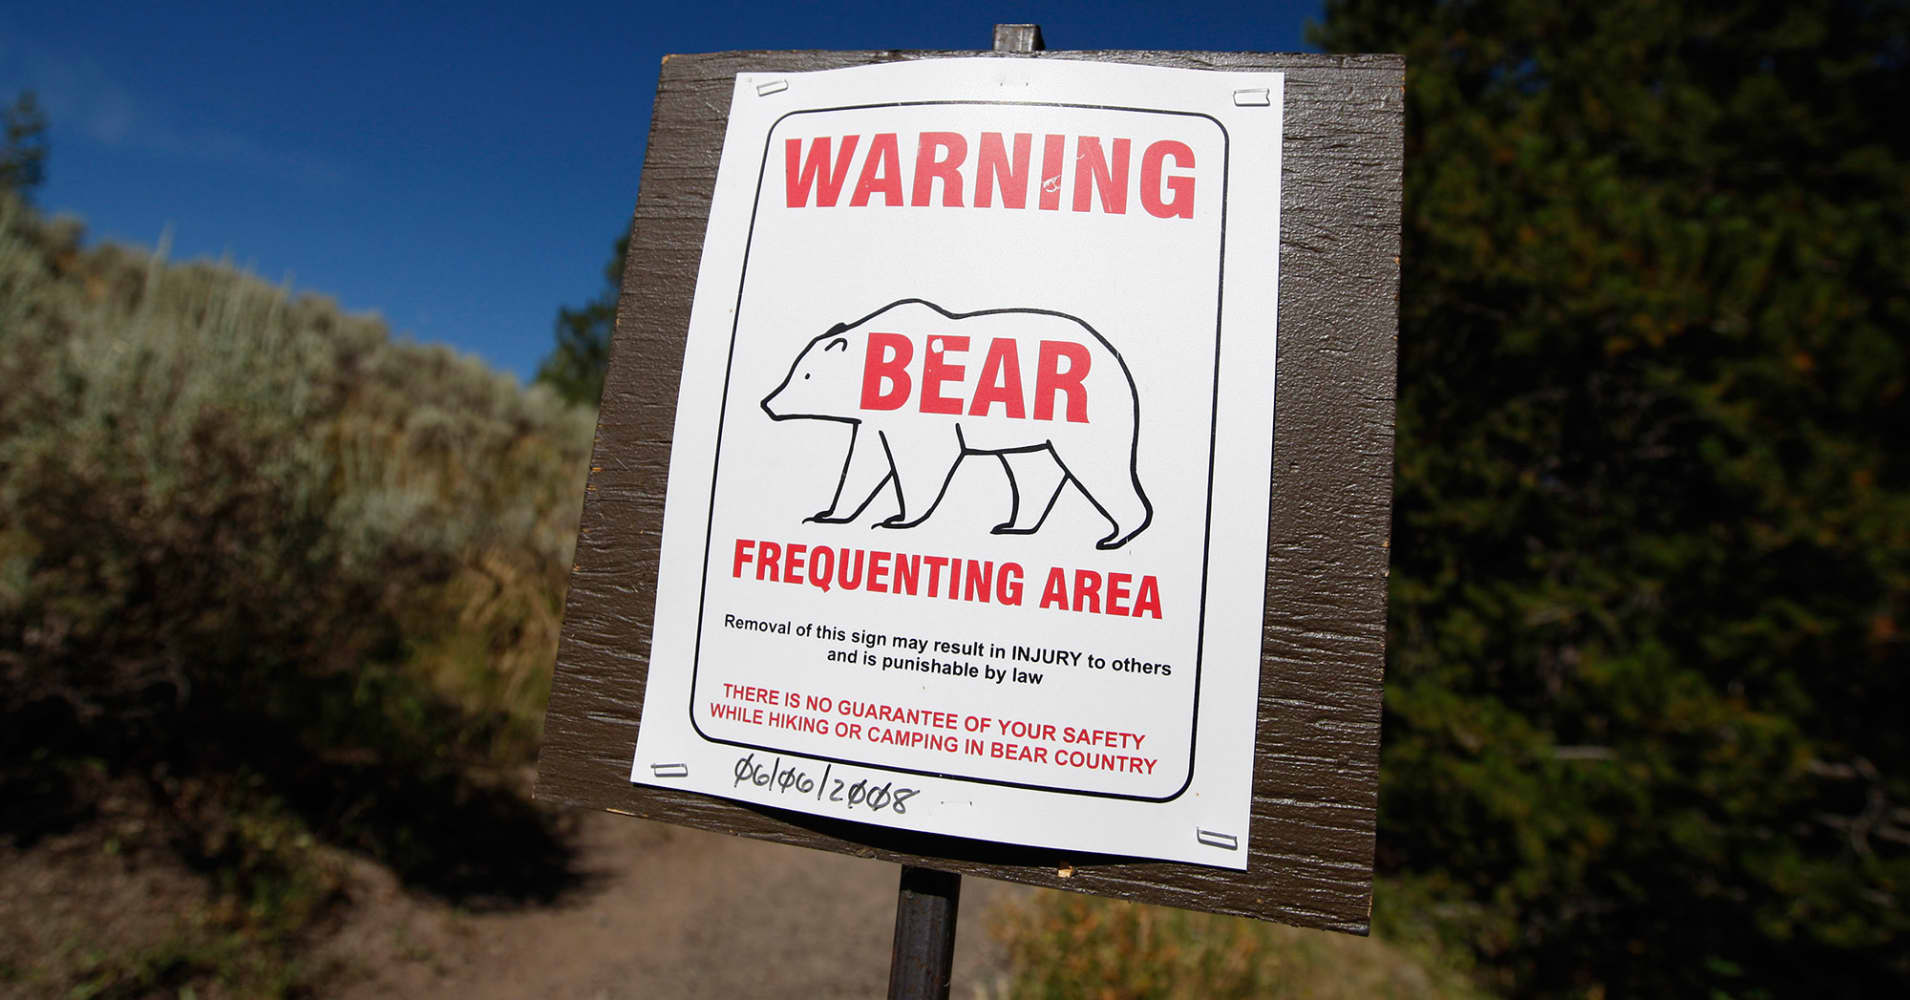 Syria strike, N. Korea could push Wall Street into bear market